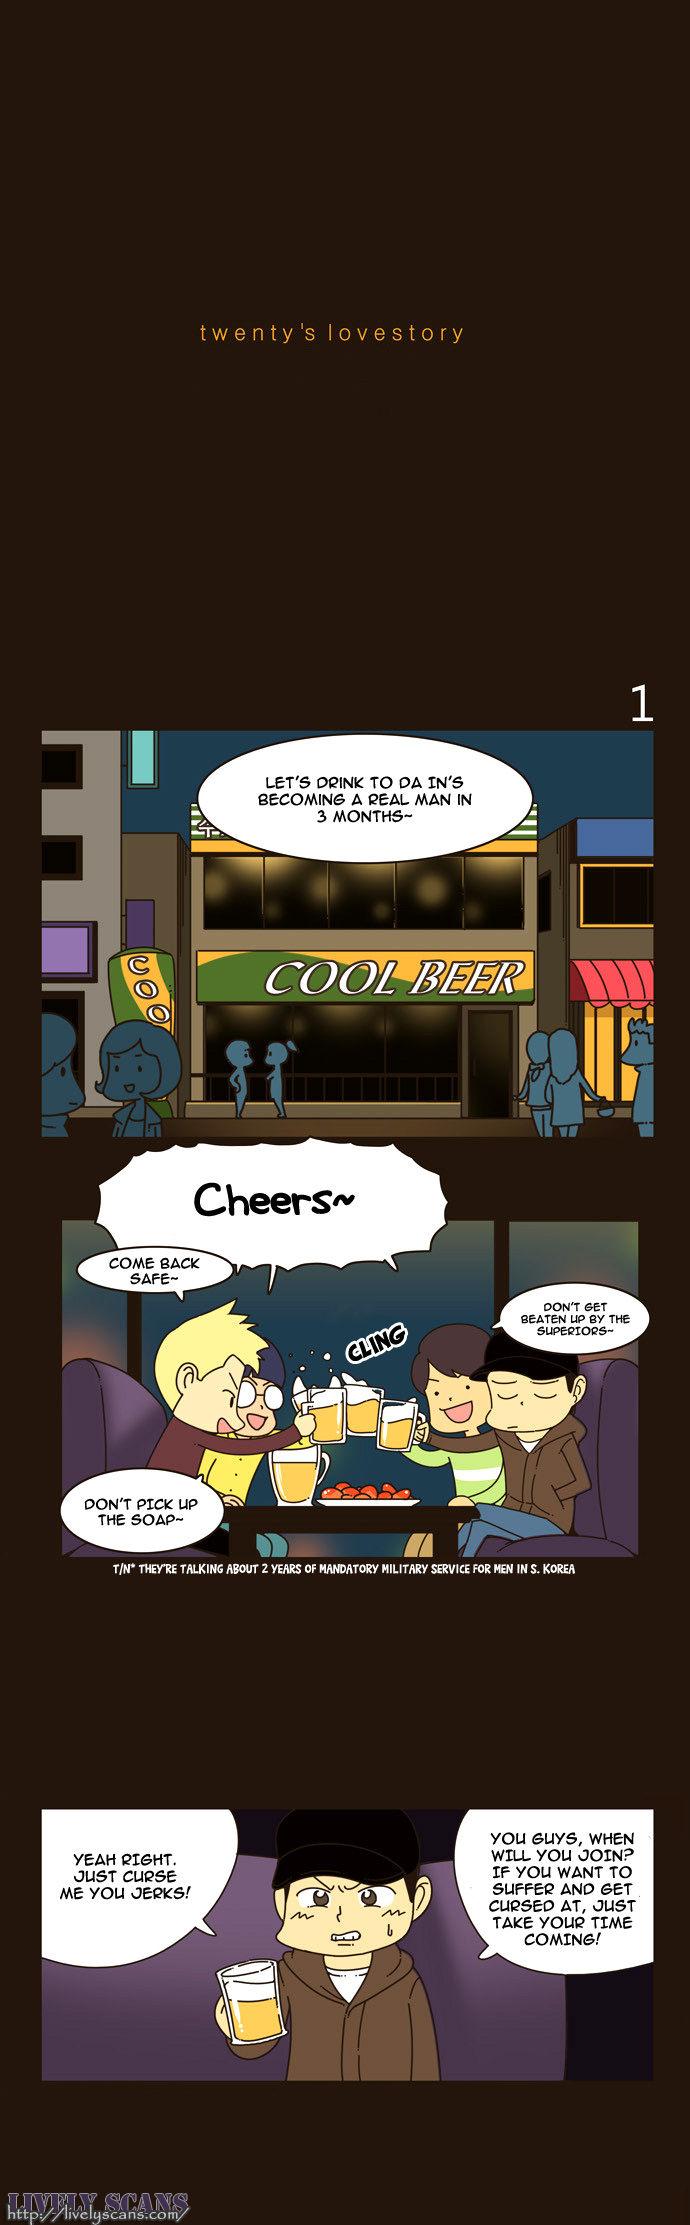 Twenty's Lovestory 1 Page 2